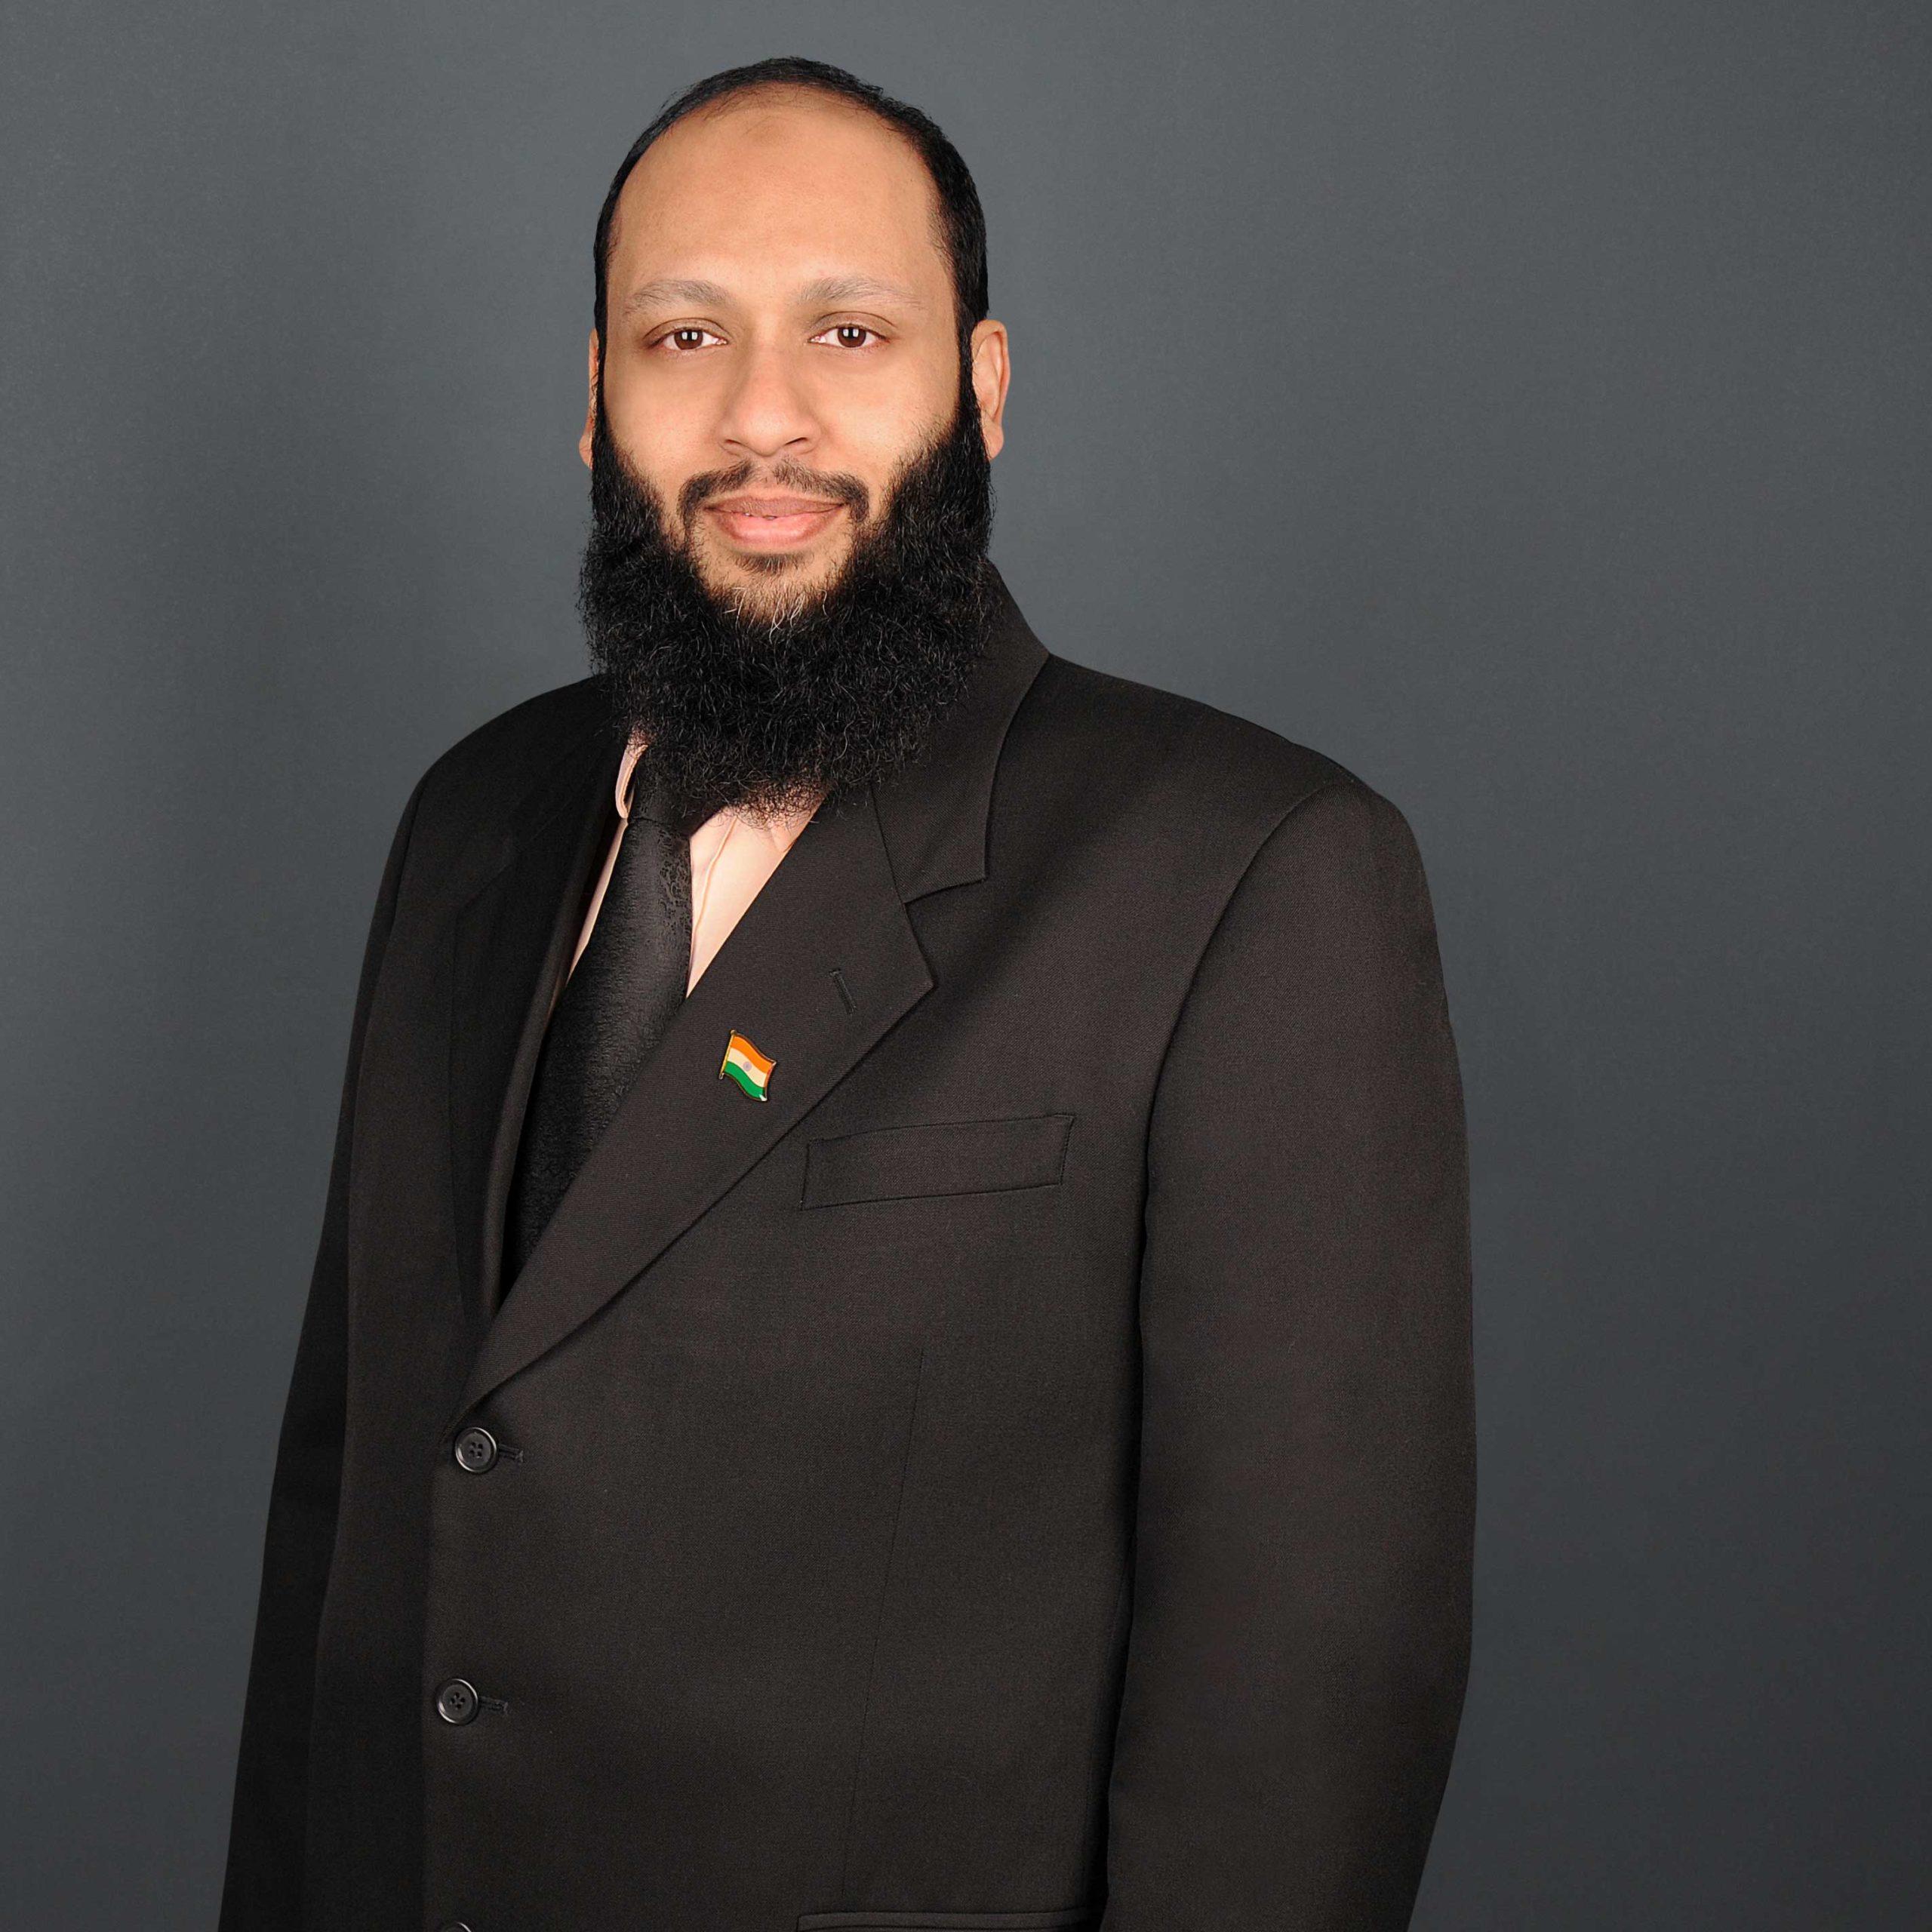 Picture of Abdul Rahman Khalidi